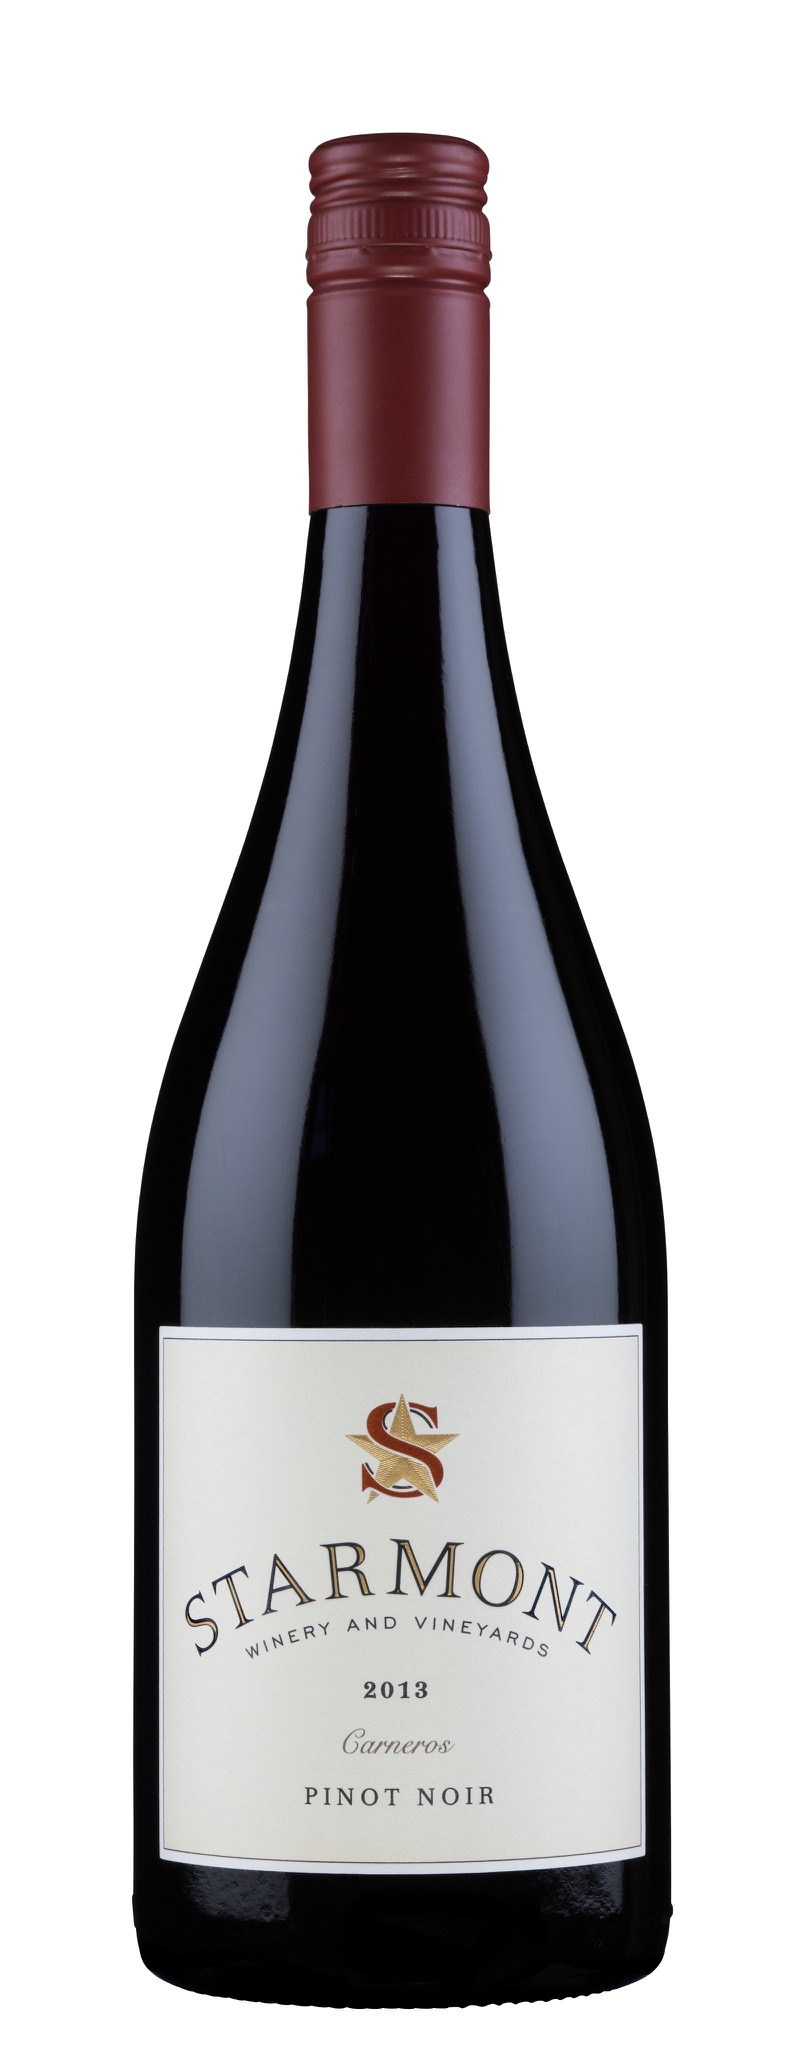 2013 Starmont Pinot Noir Carneros